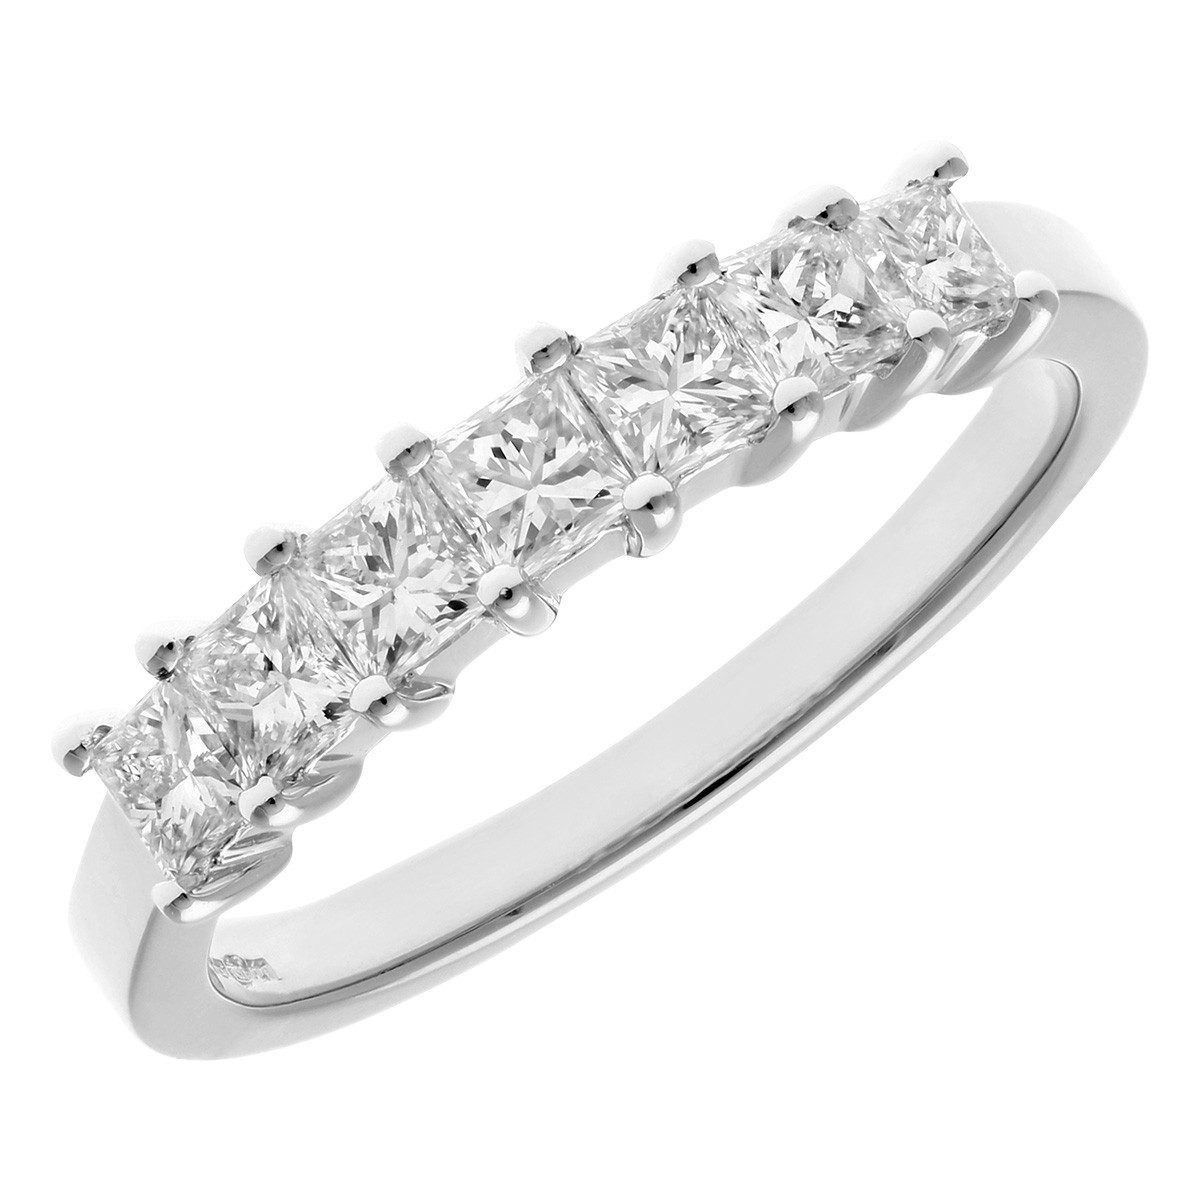 18CT WHITE GOLD 0.75CT DIAMOND PRINCESS CUT 7 STONE 1/2 ETERNITY RING